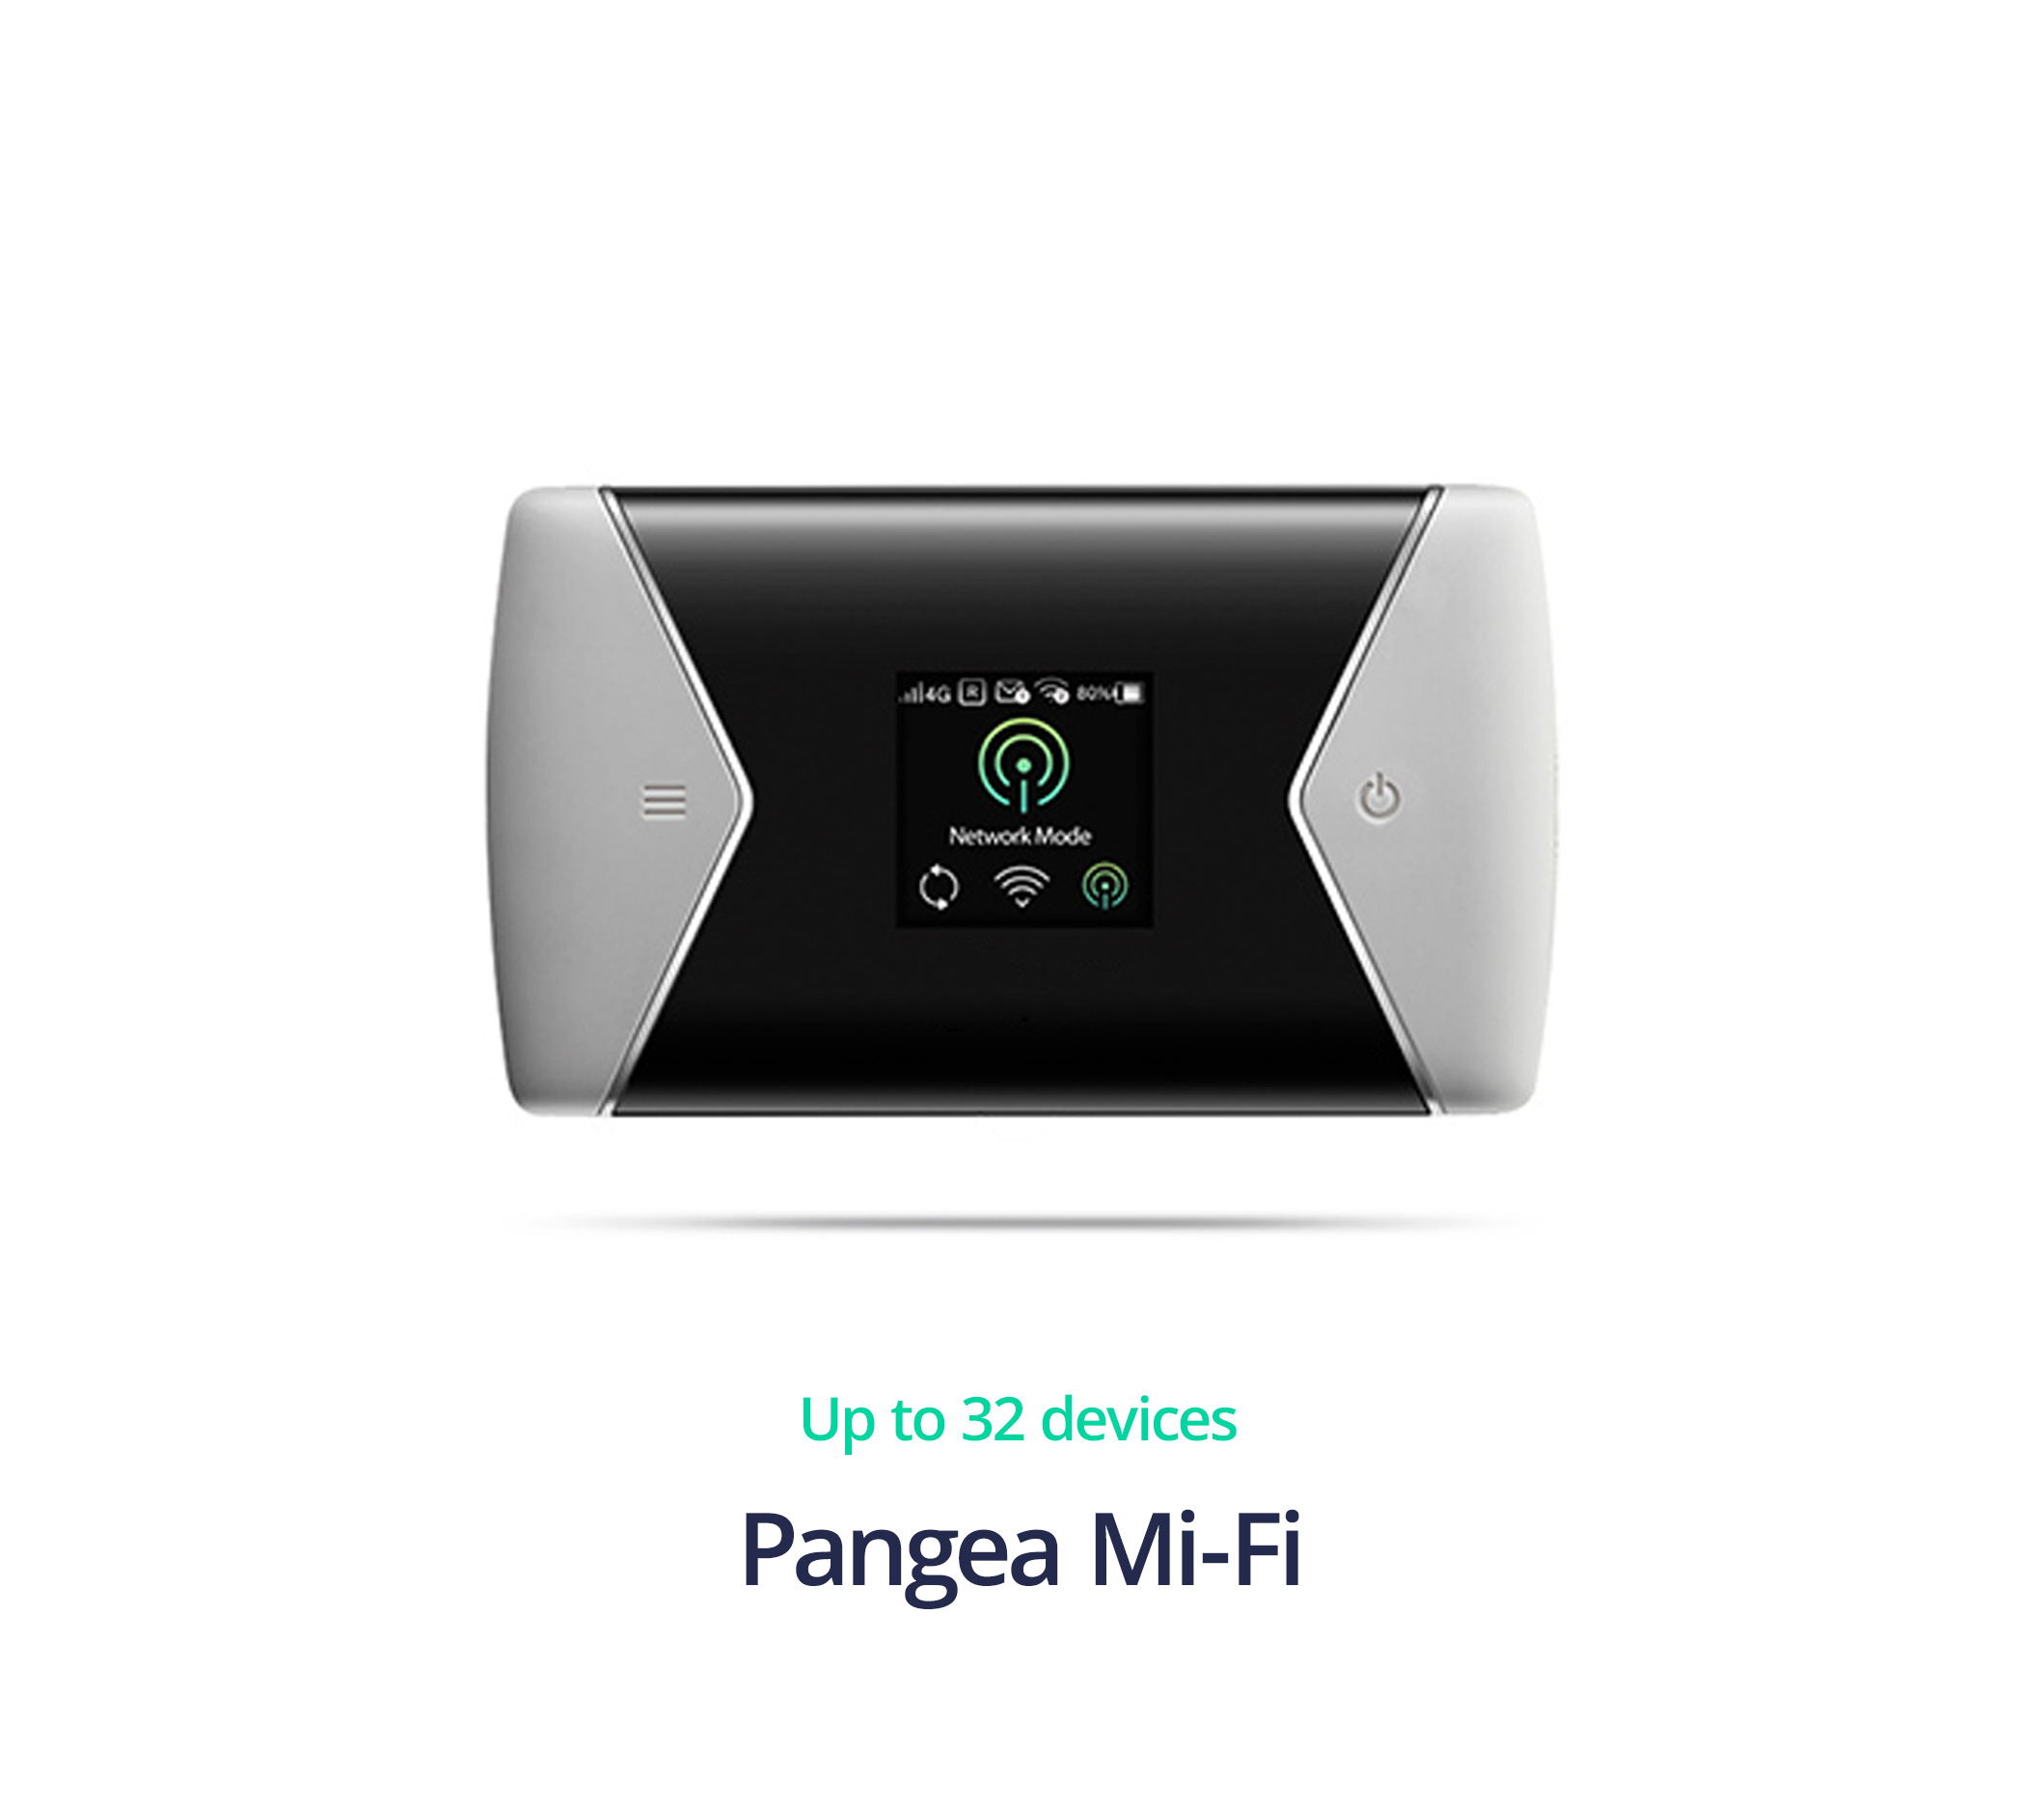 Pangea 4G Bonded router - Pangea Mi-Fi link